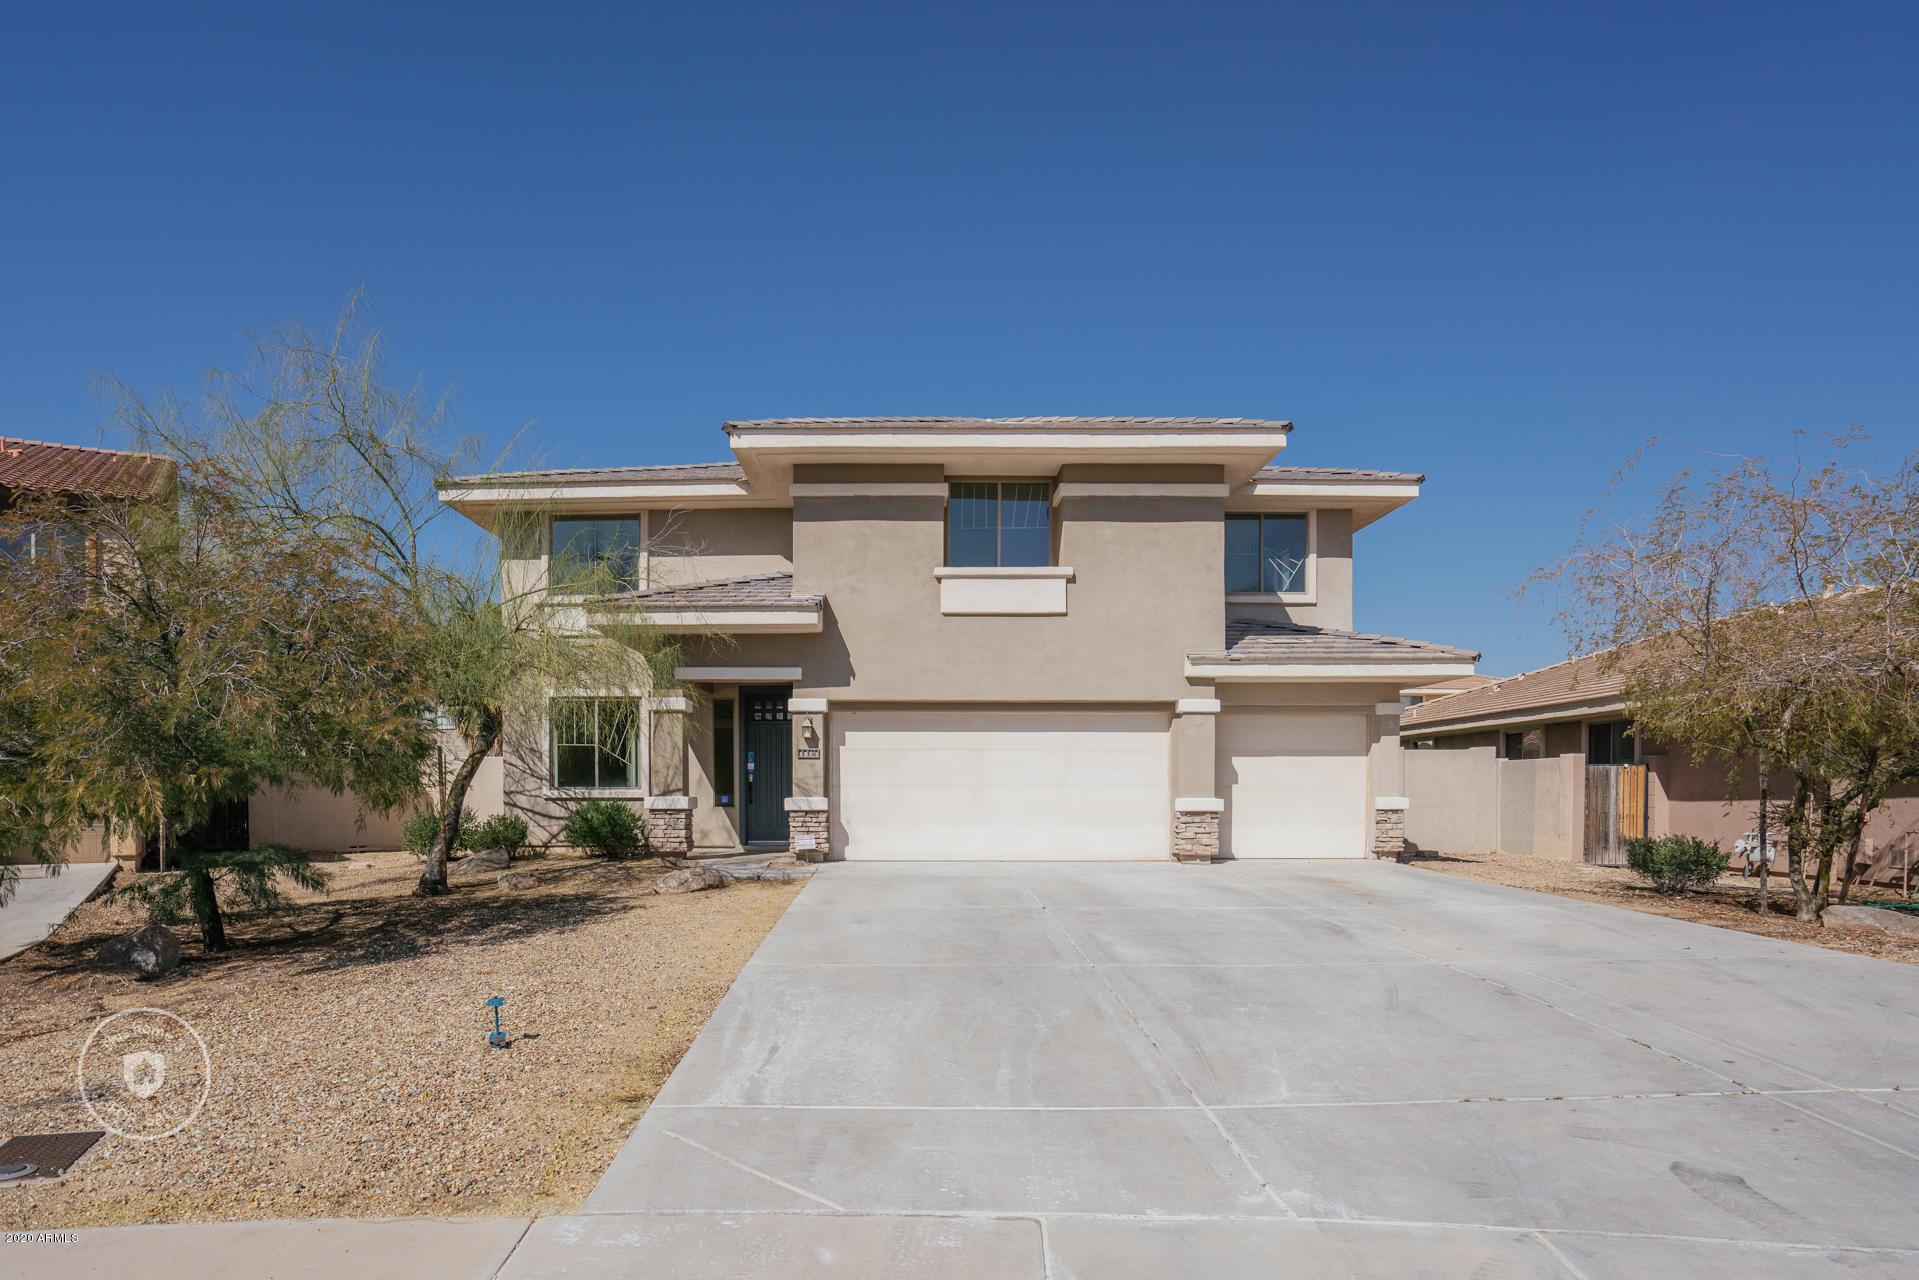 Photo of 118 N 109TH Avenue, Avondale, AZ 85323